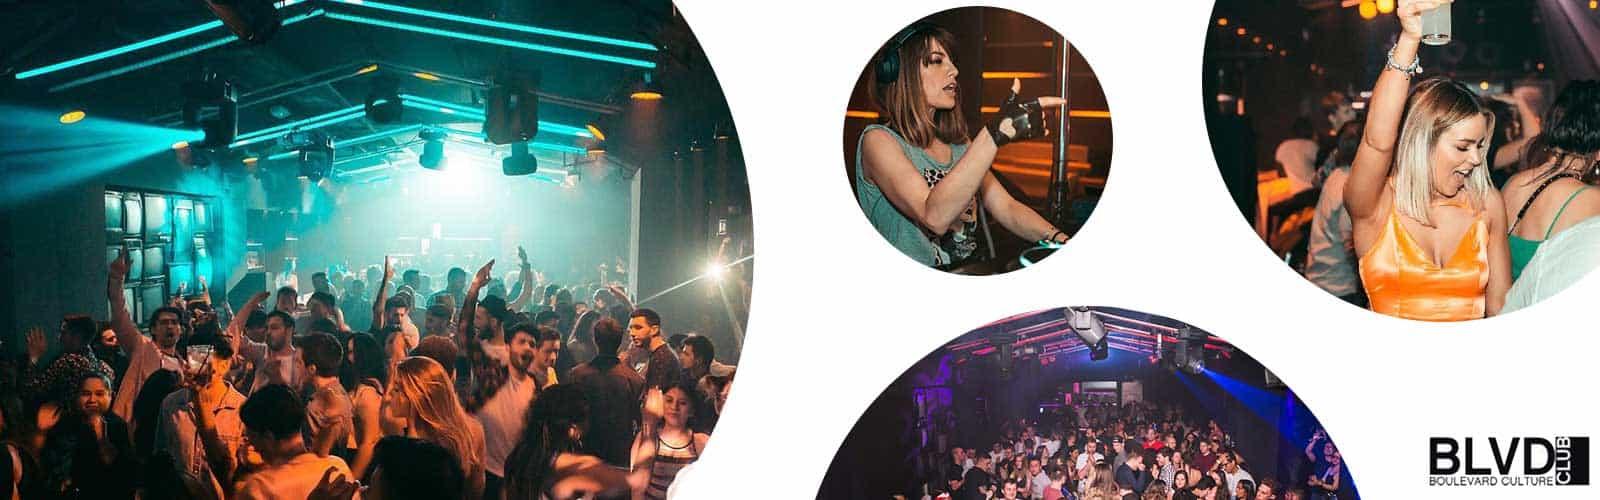 Club Boulevard Barcelona